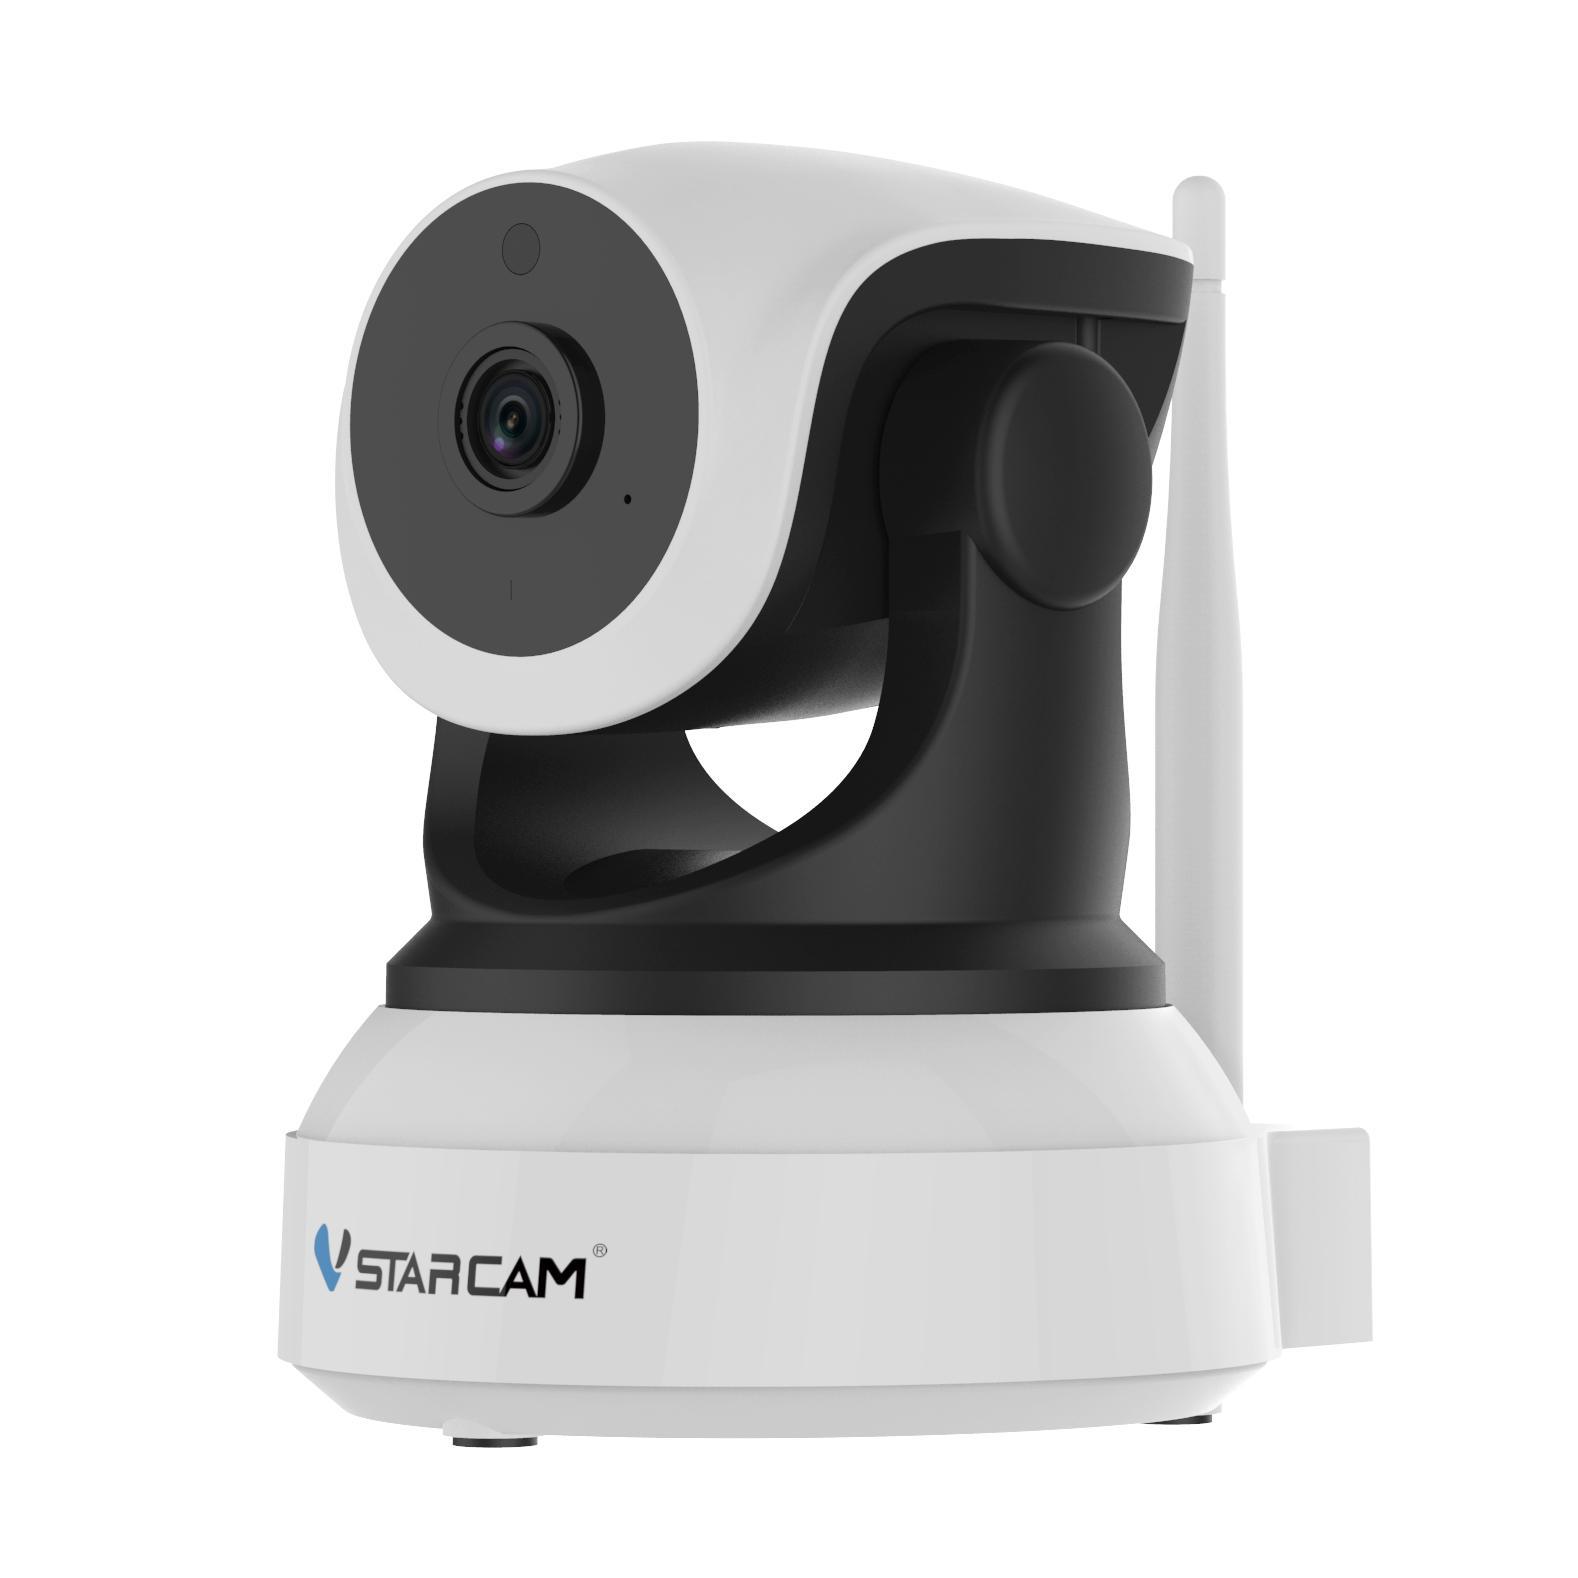 VStarcam C24S 200万像素网络摄像机 3